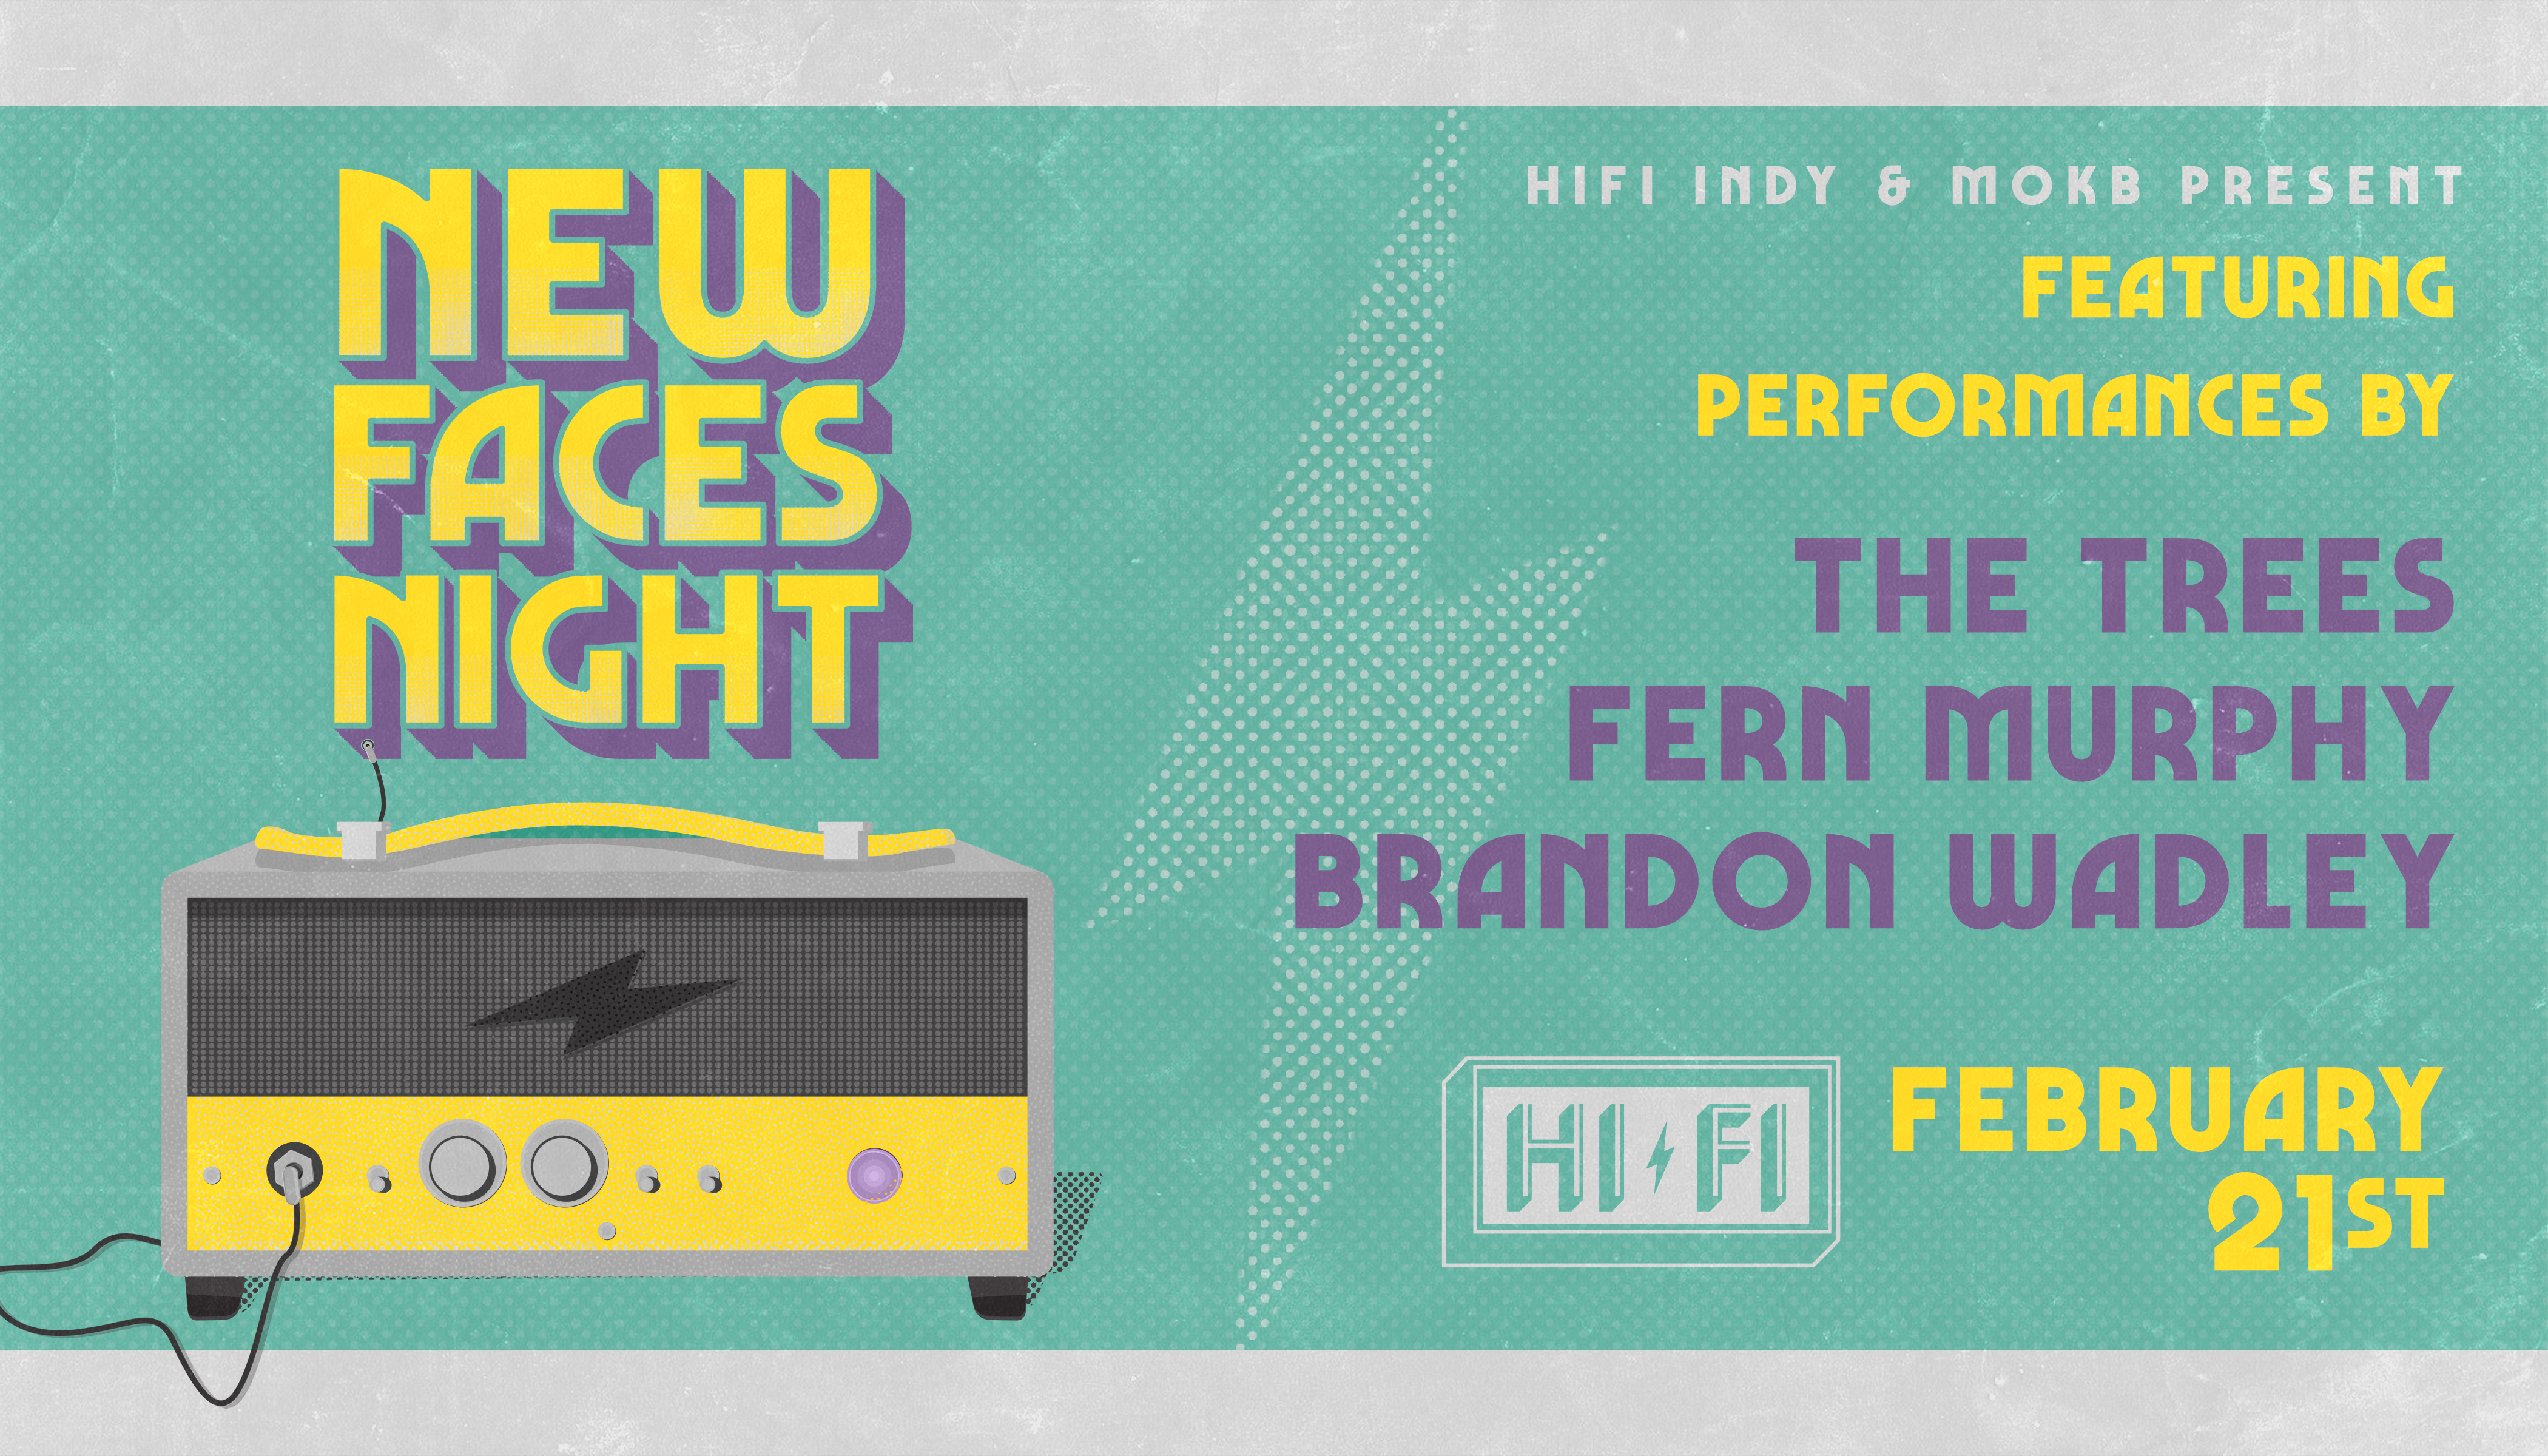 New Faces Night at HI-FI February 2019